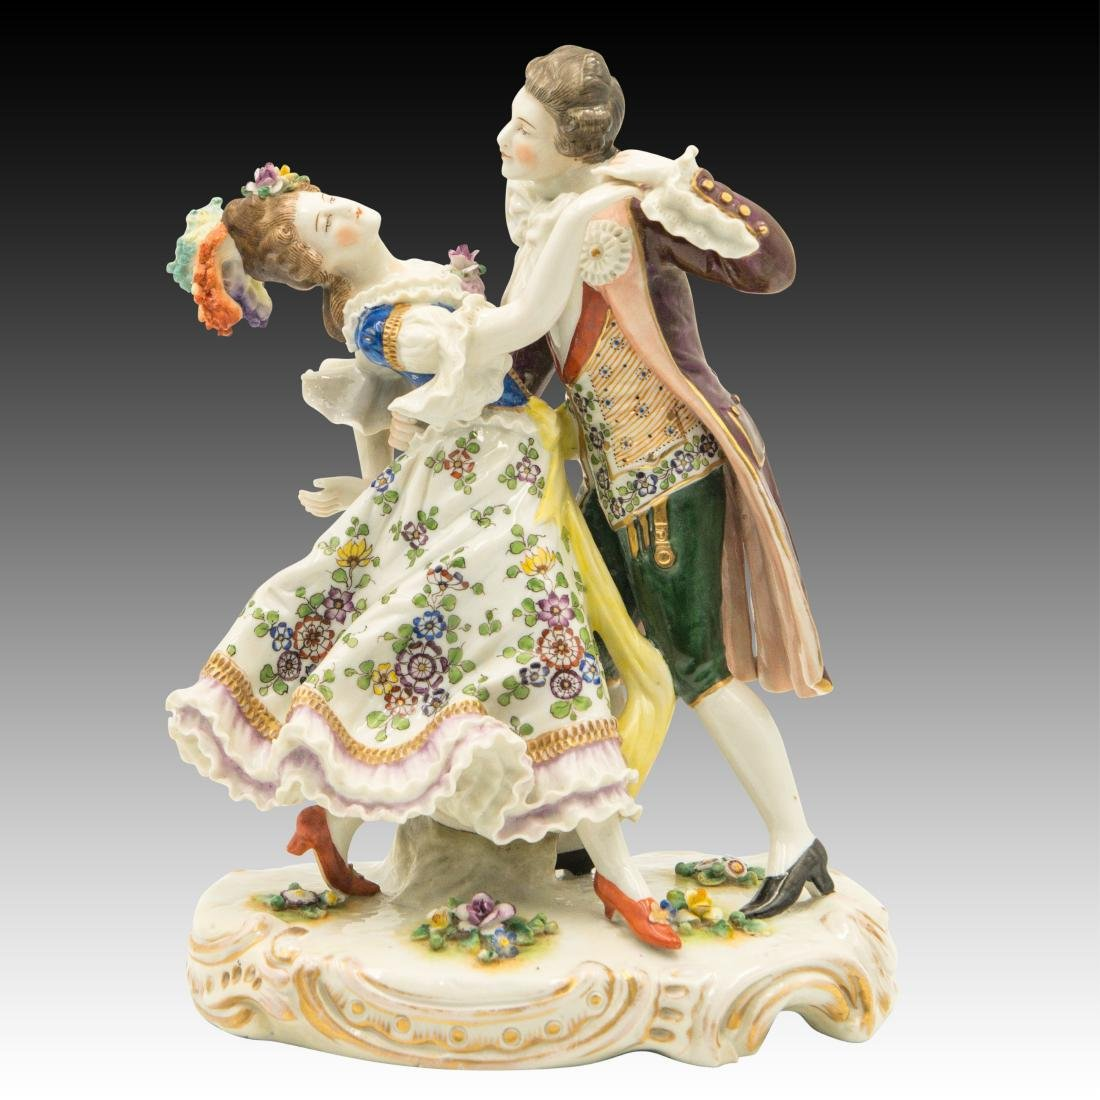 Sitzendorf French Style Dancing Couple Figurine